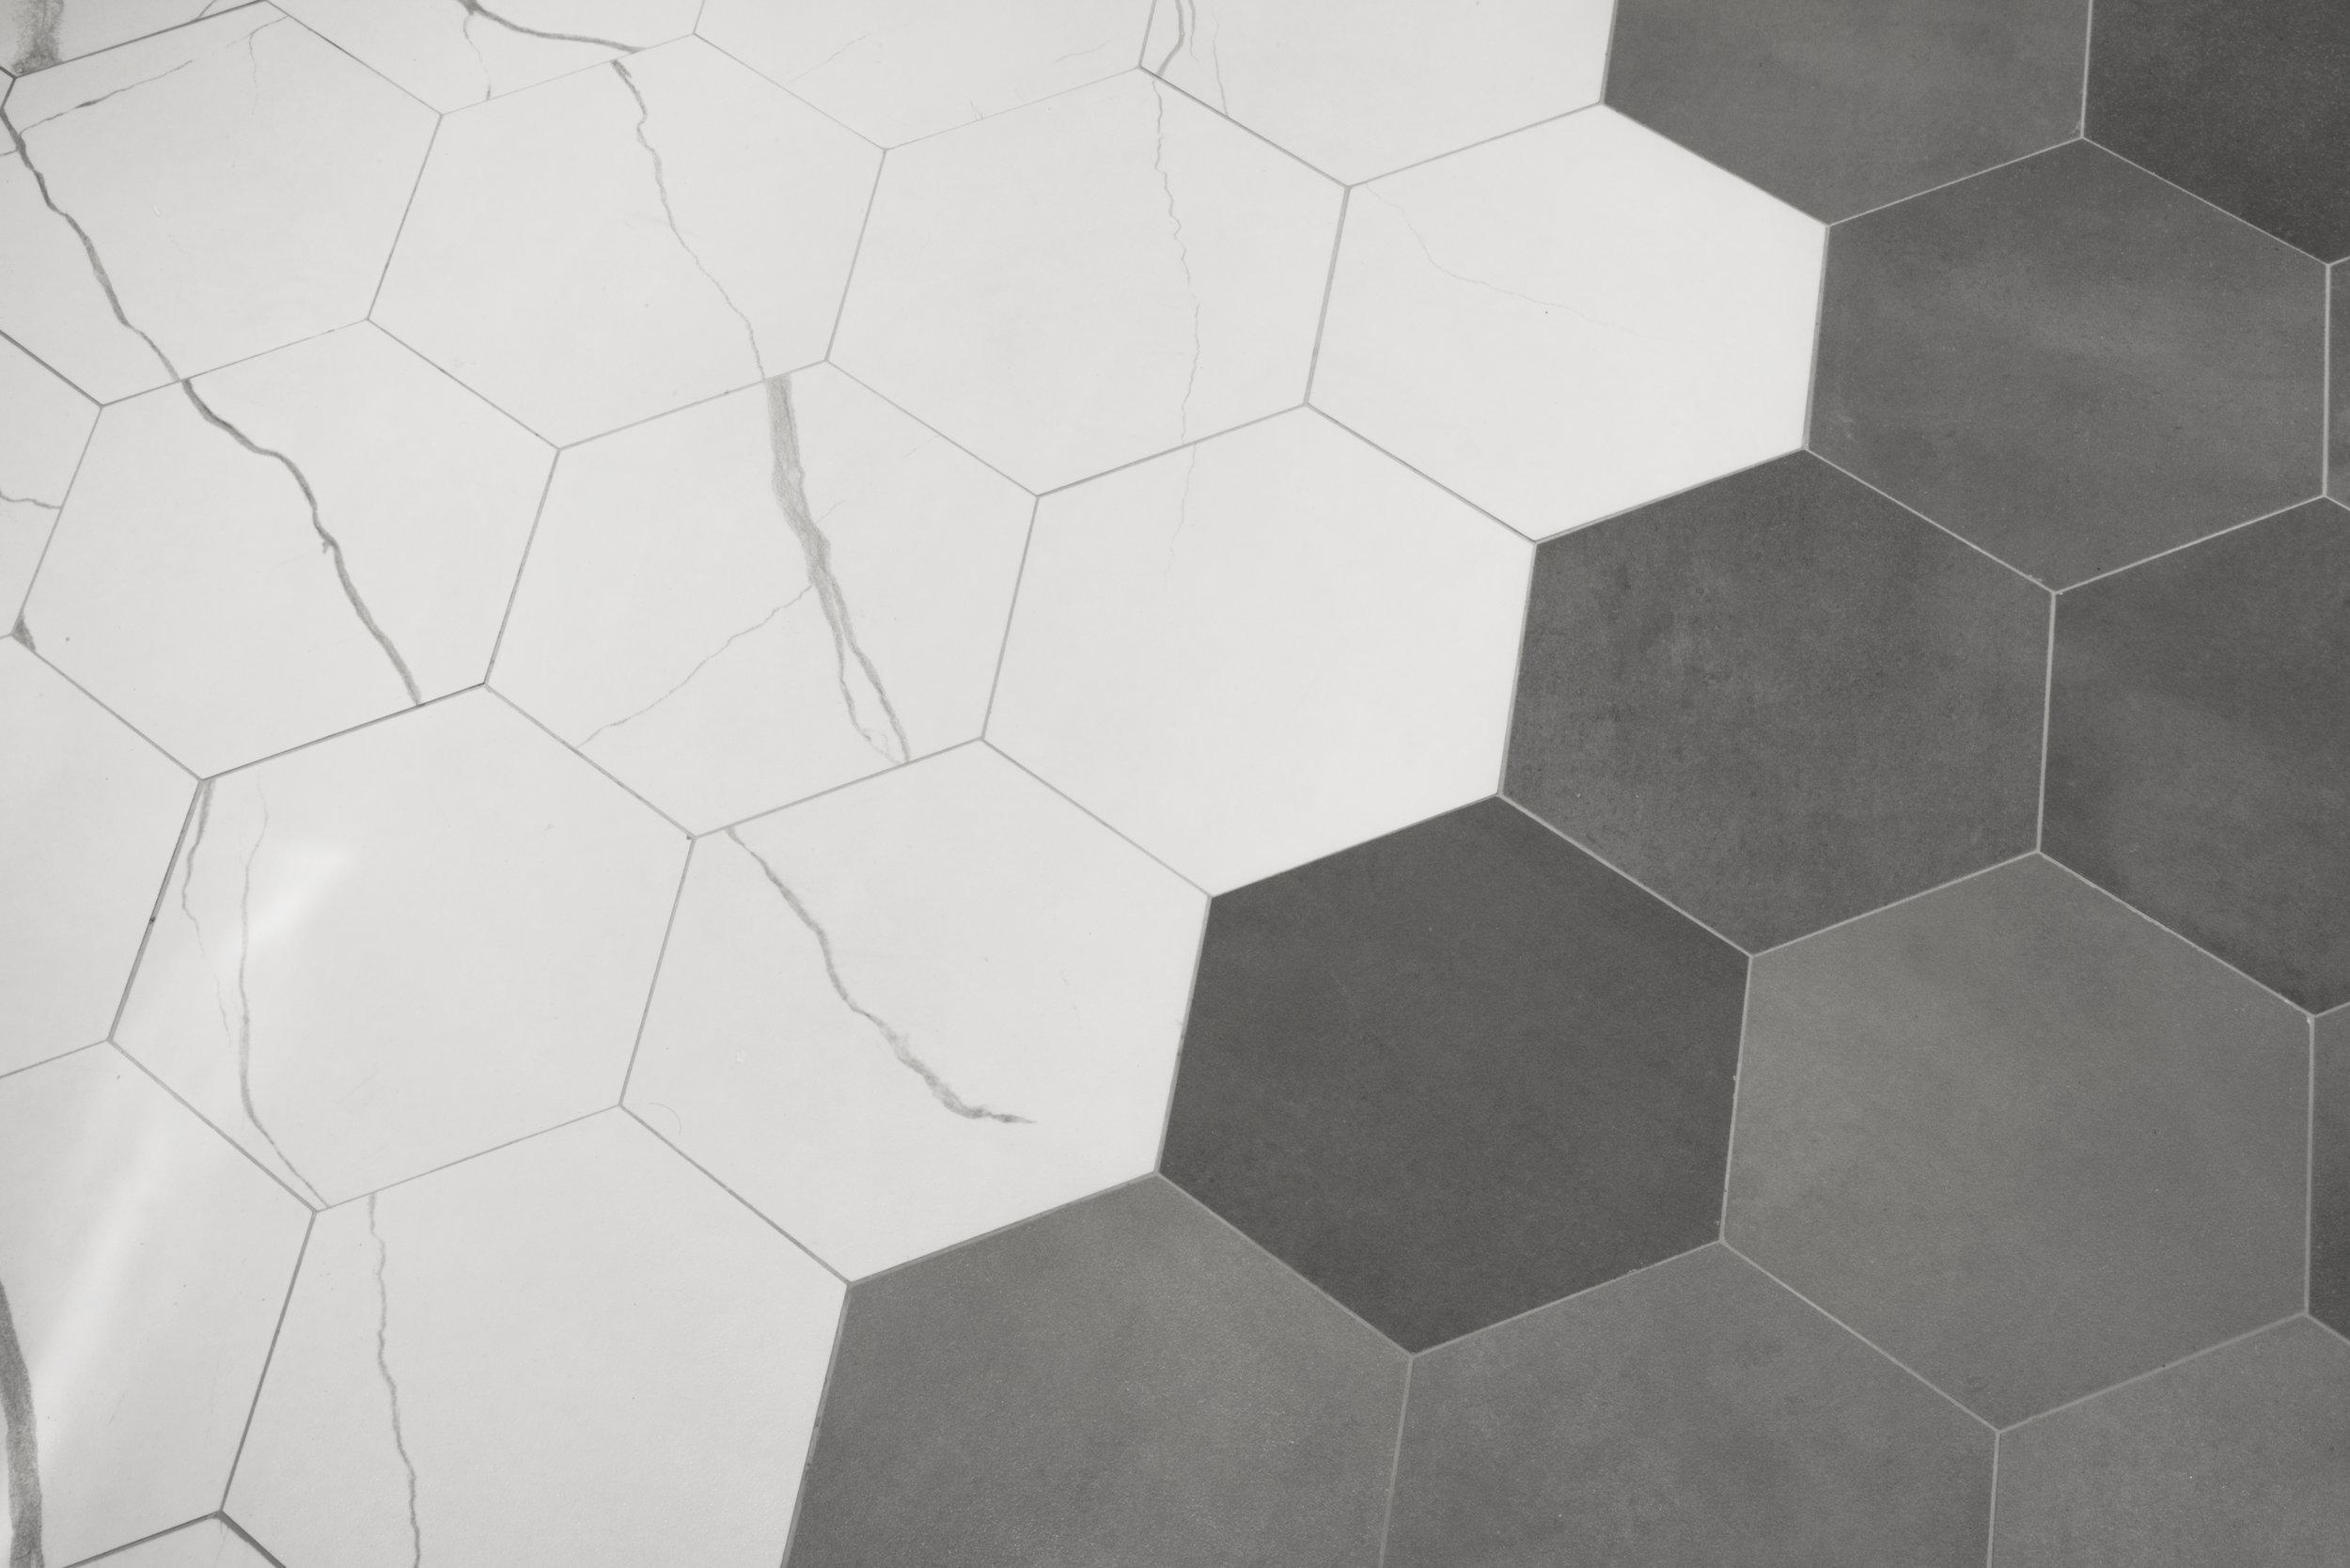 Tribeca Renovation by Bolster - bathroom tiles detail 2.jpg